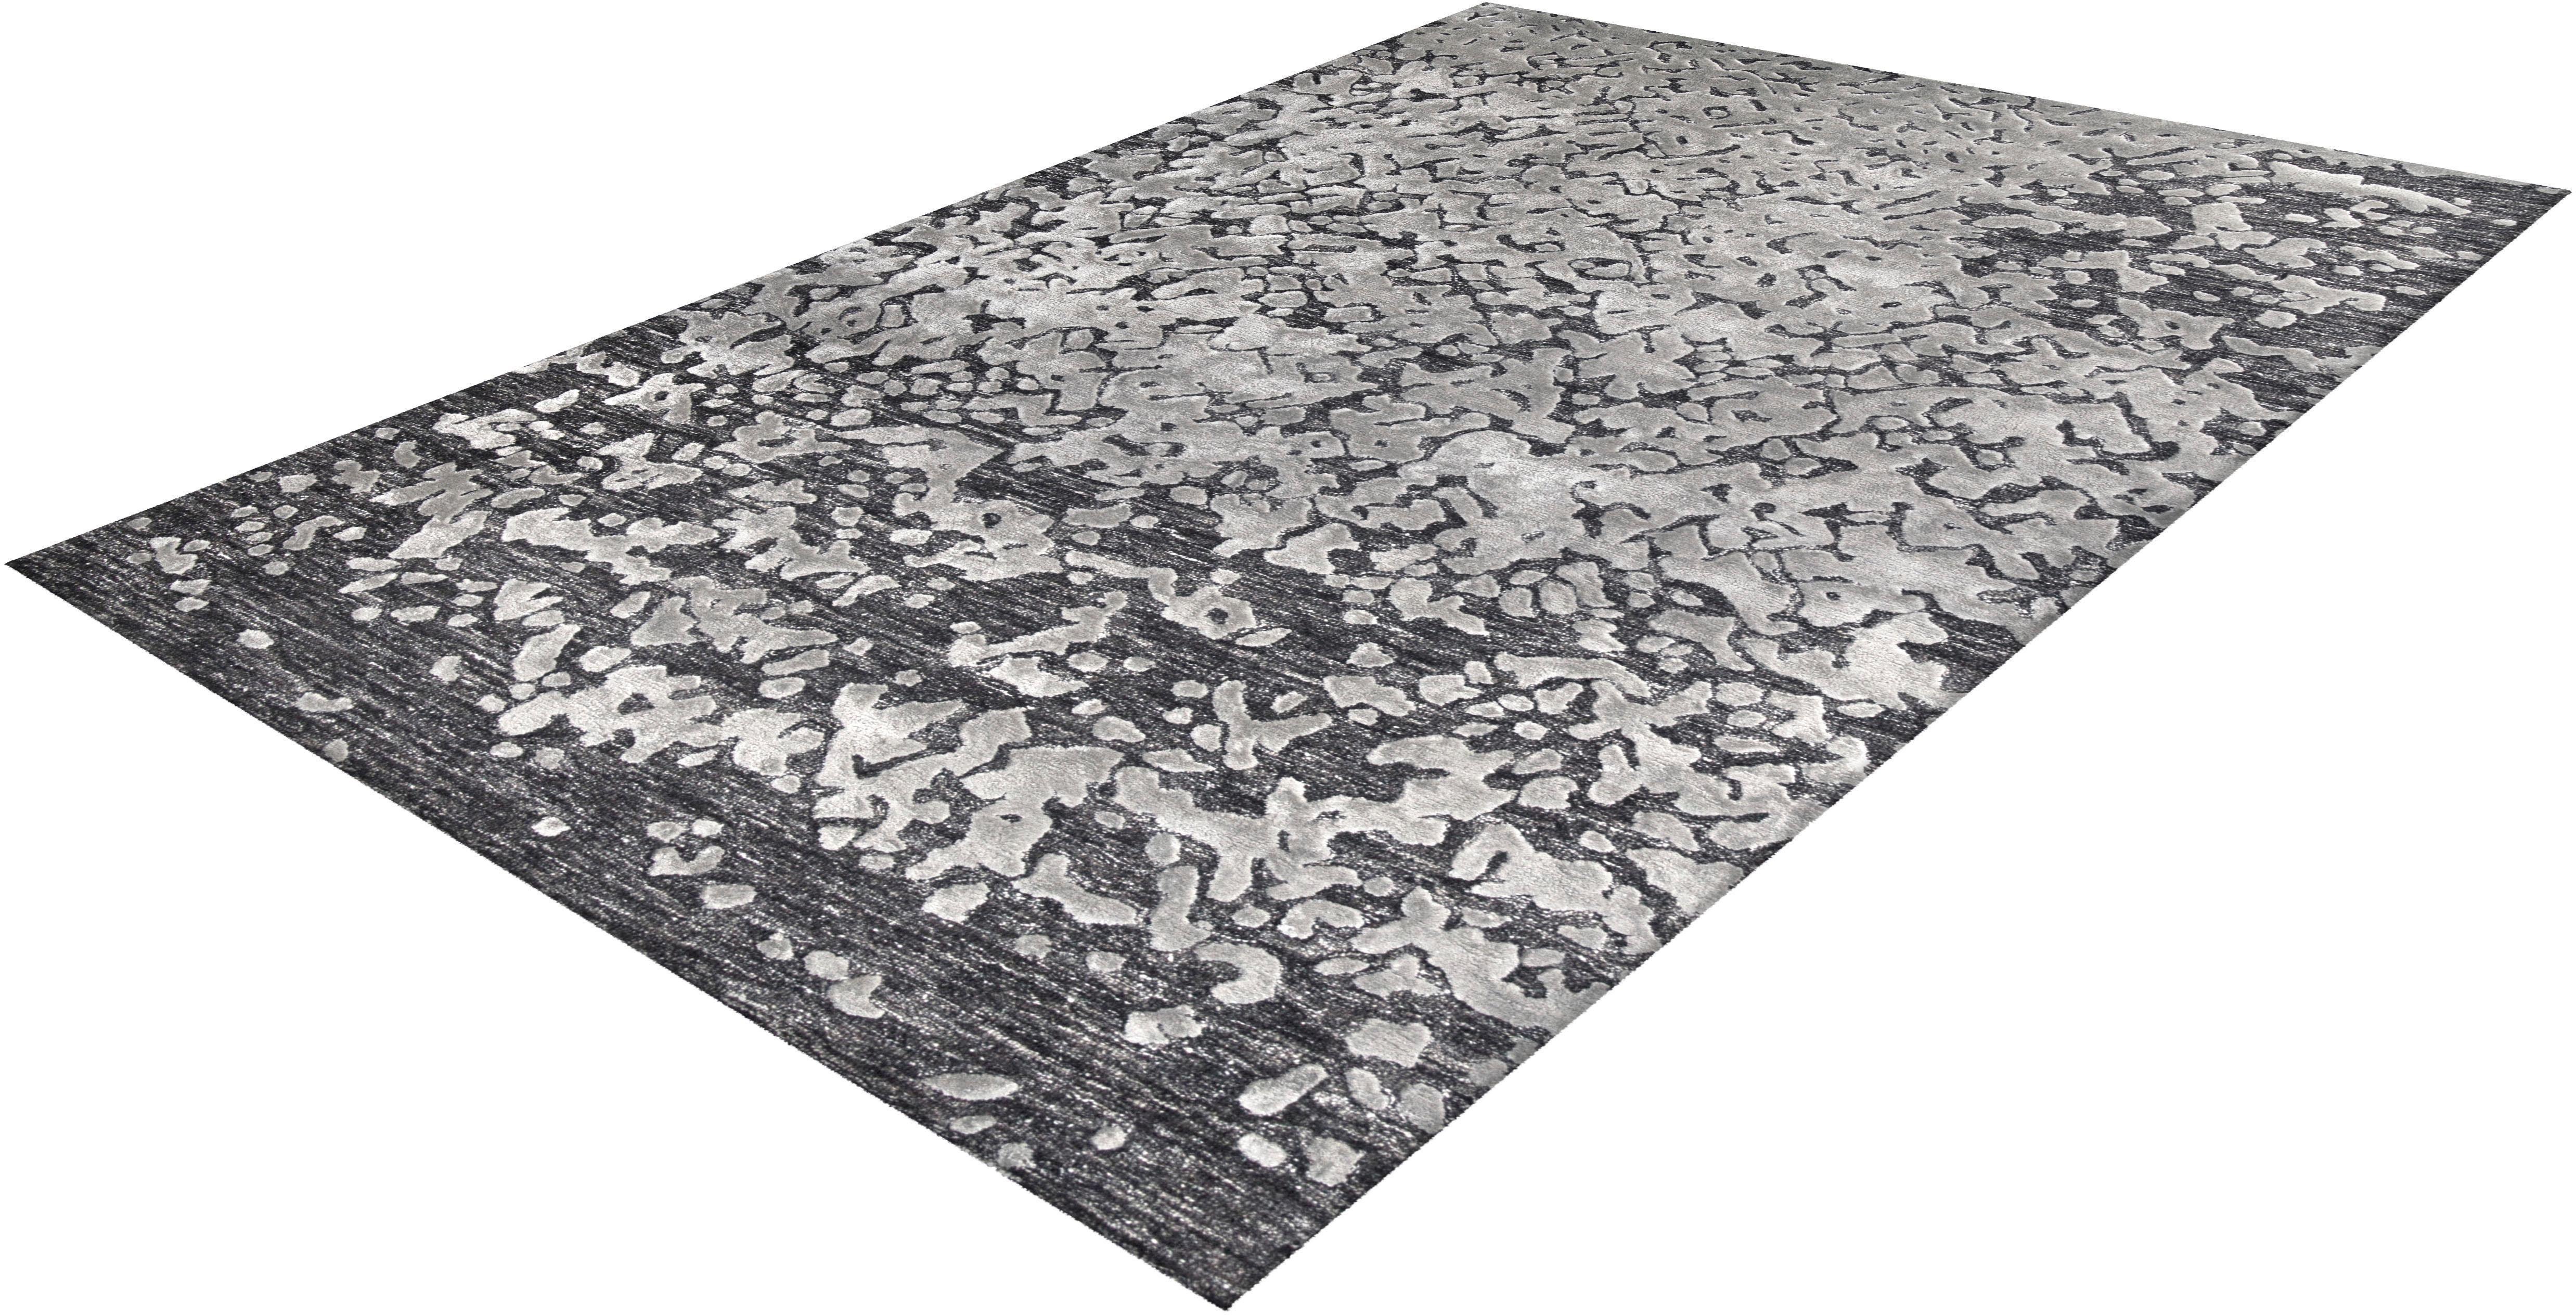 Teppich Shailene 500 calo-deluxe rechteckig Höhe 17 mm handgetuftet